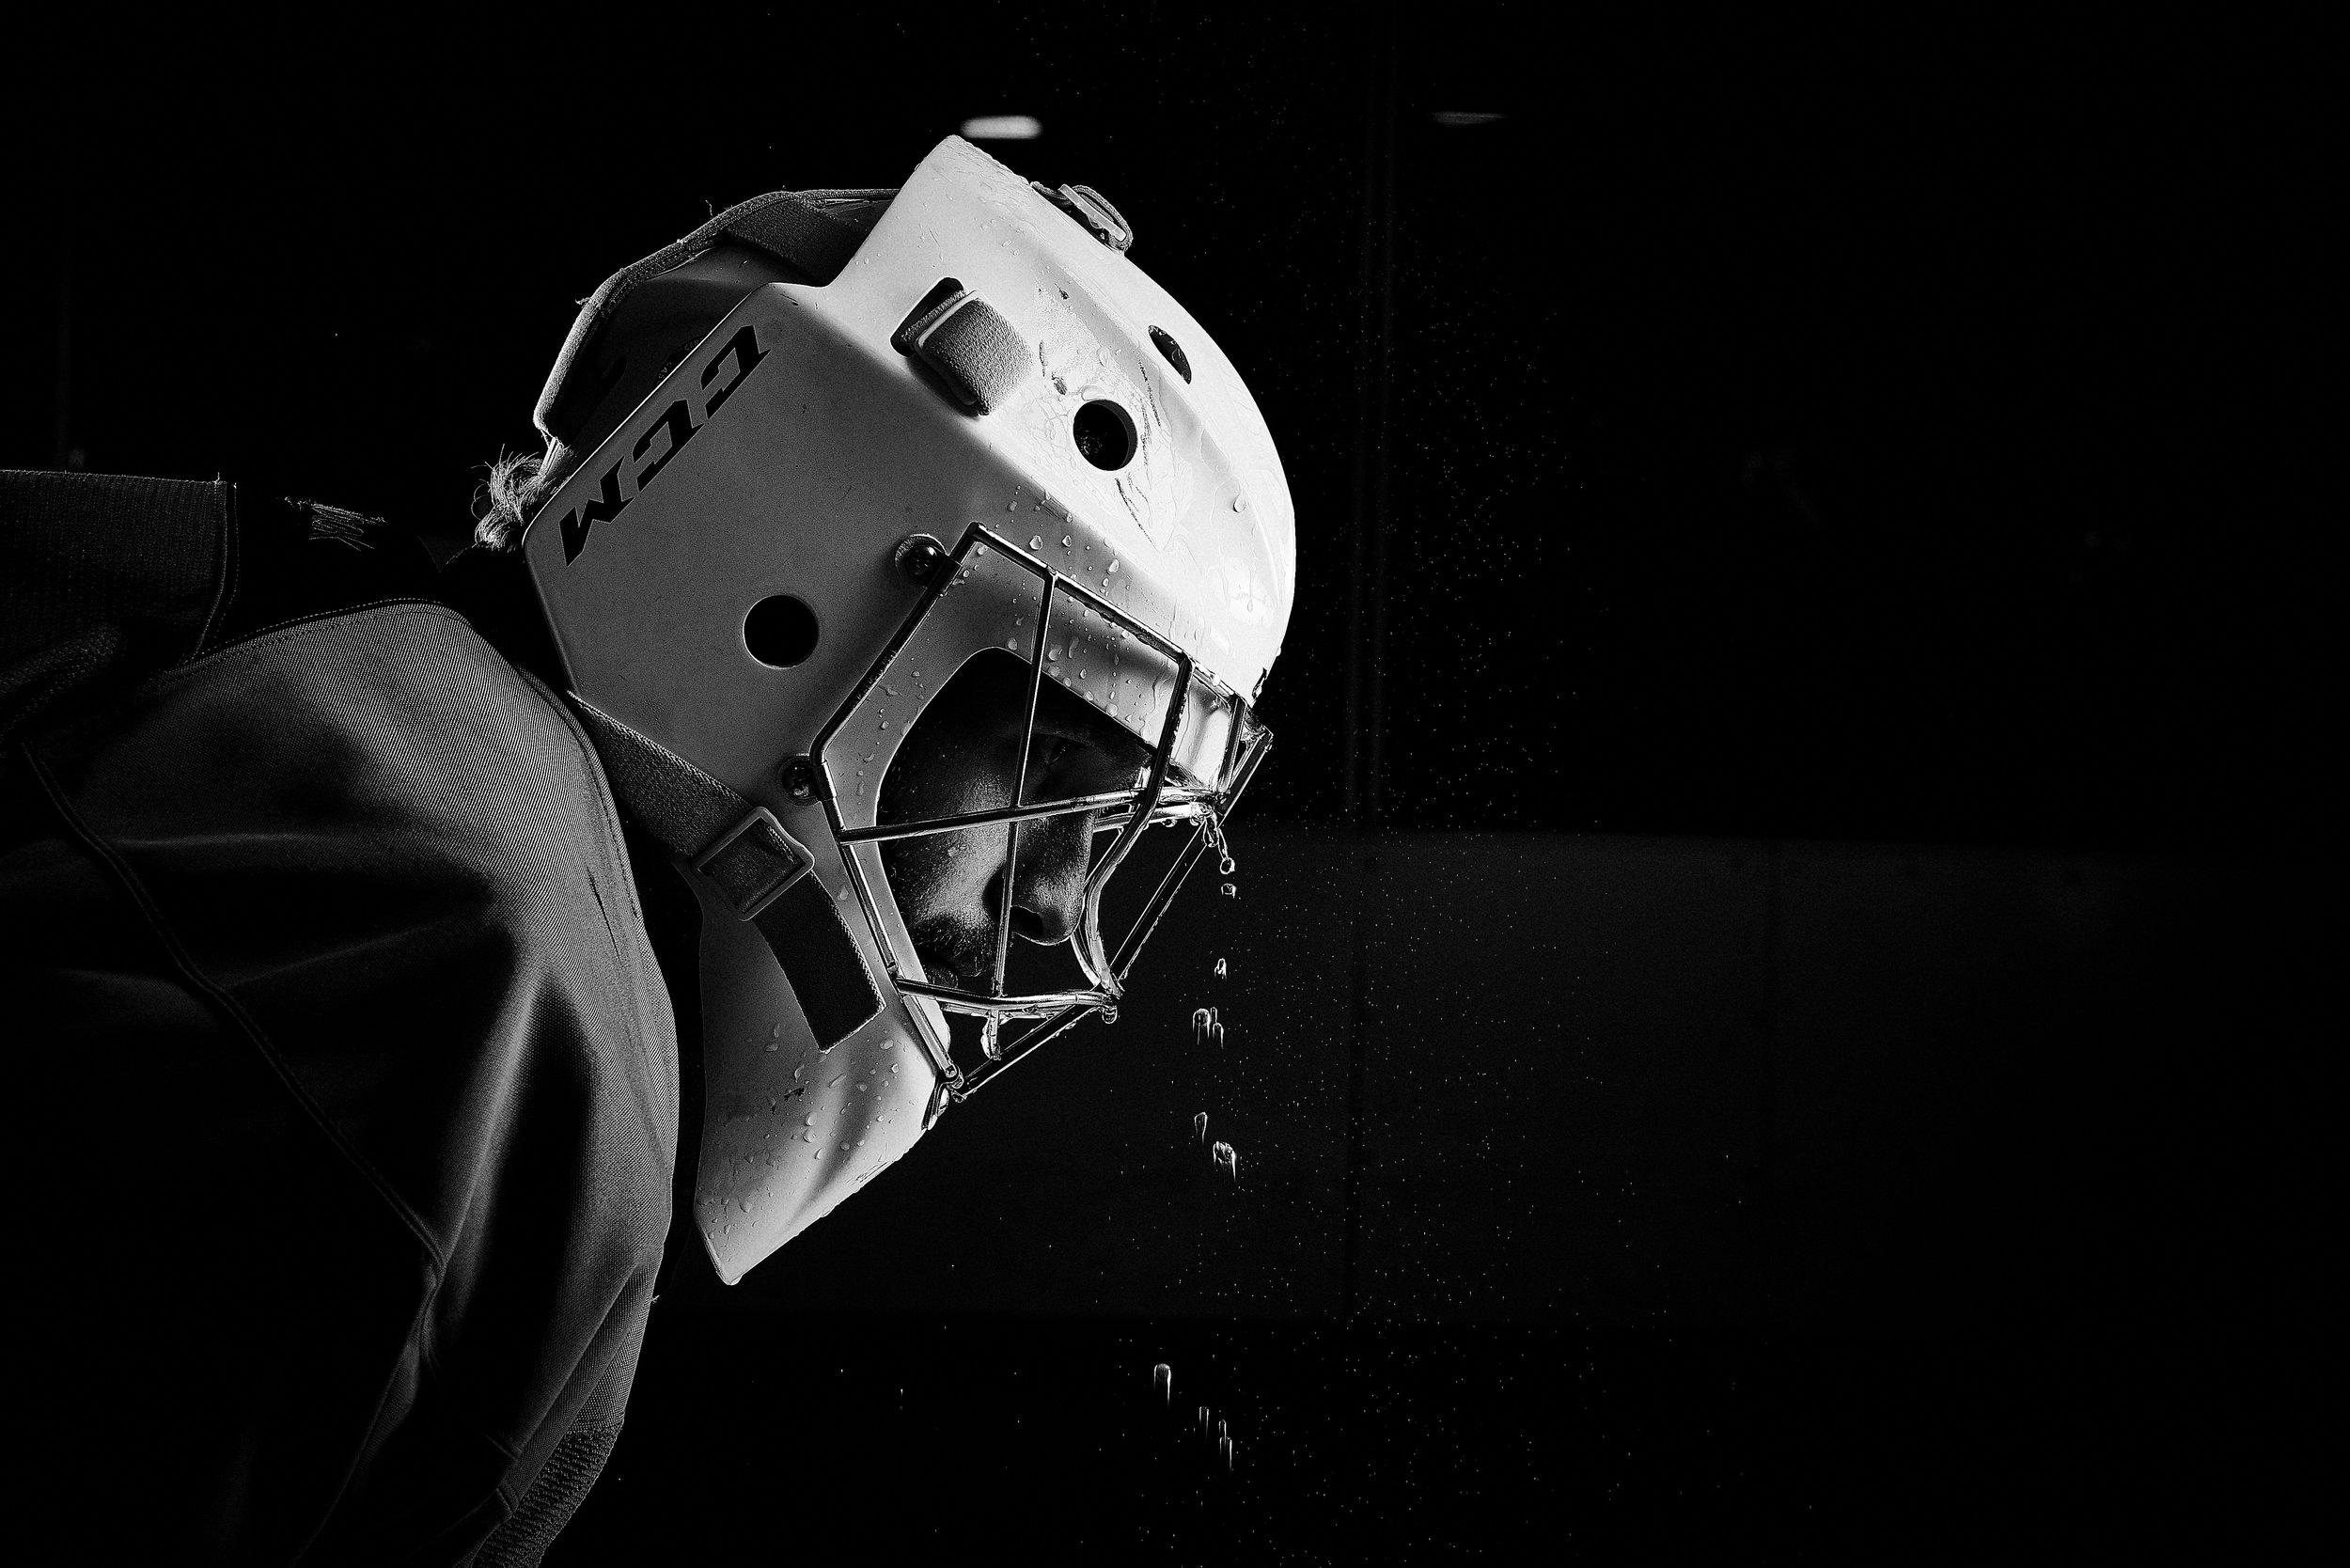 BONES_HockeyLab1274.jpg